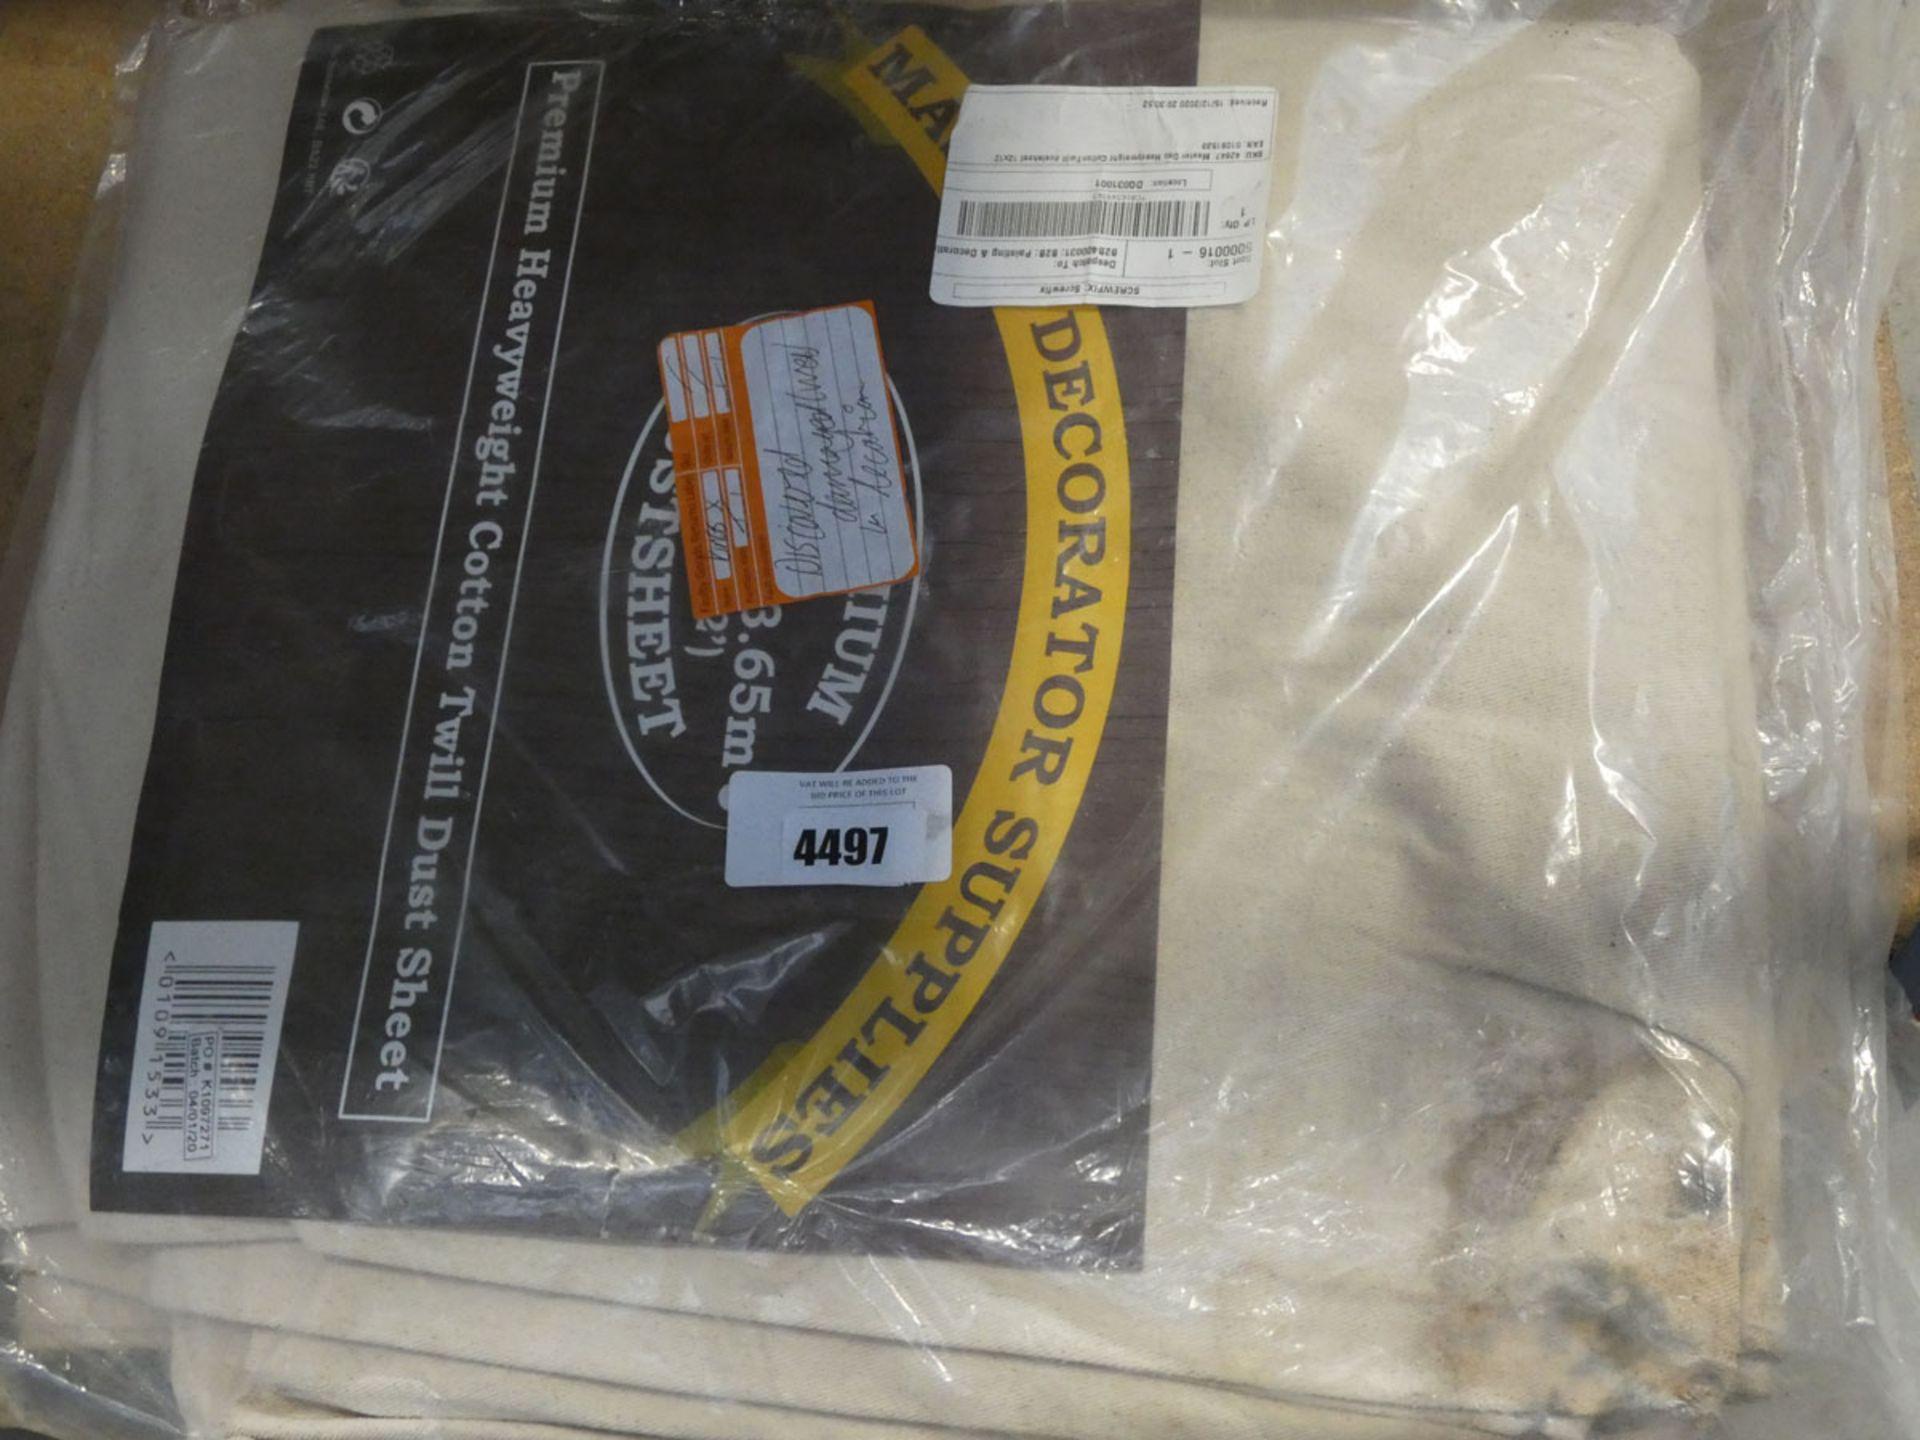 4826 Large dust sheet